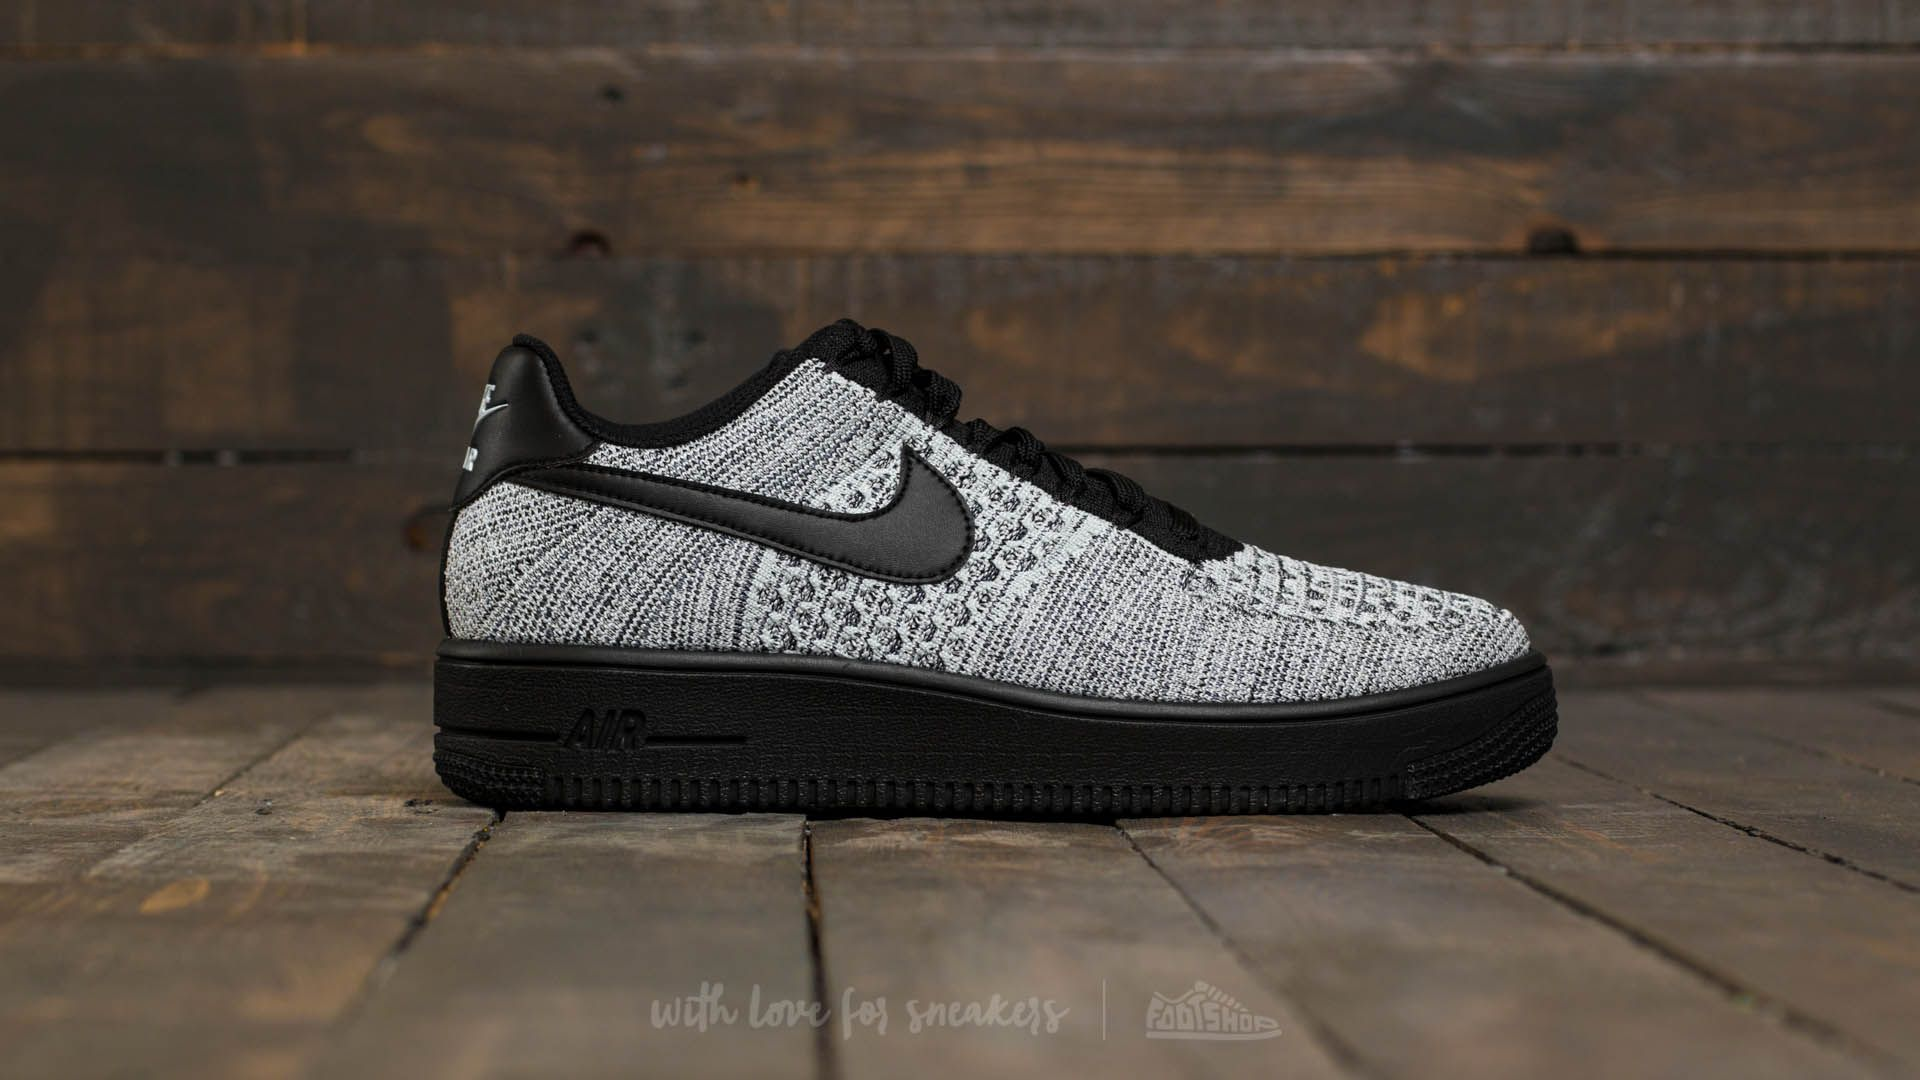 Nike Air Force 1 Ultra Flyknit Low Black Glacier Blue White